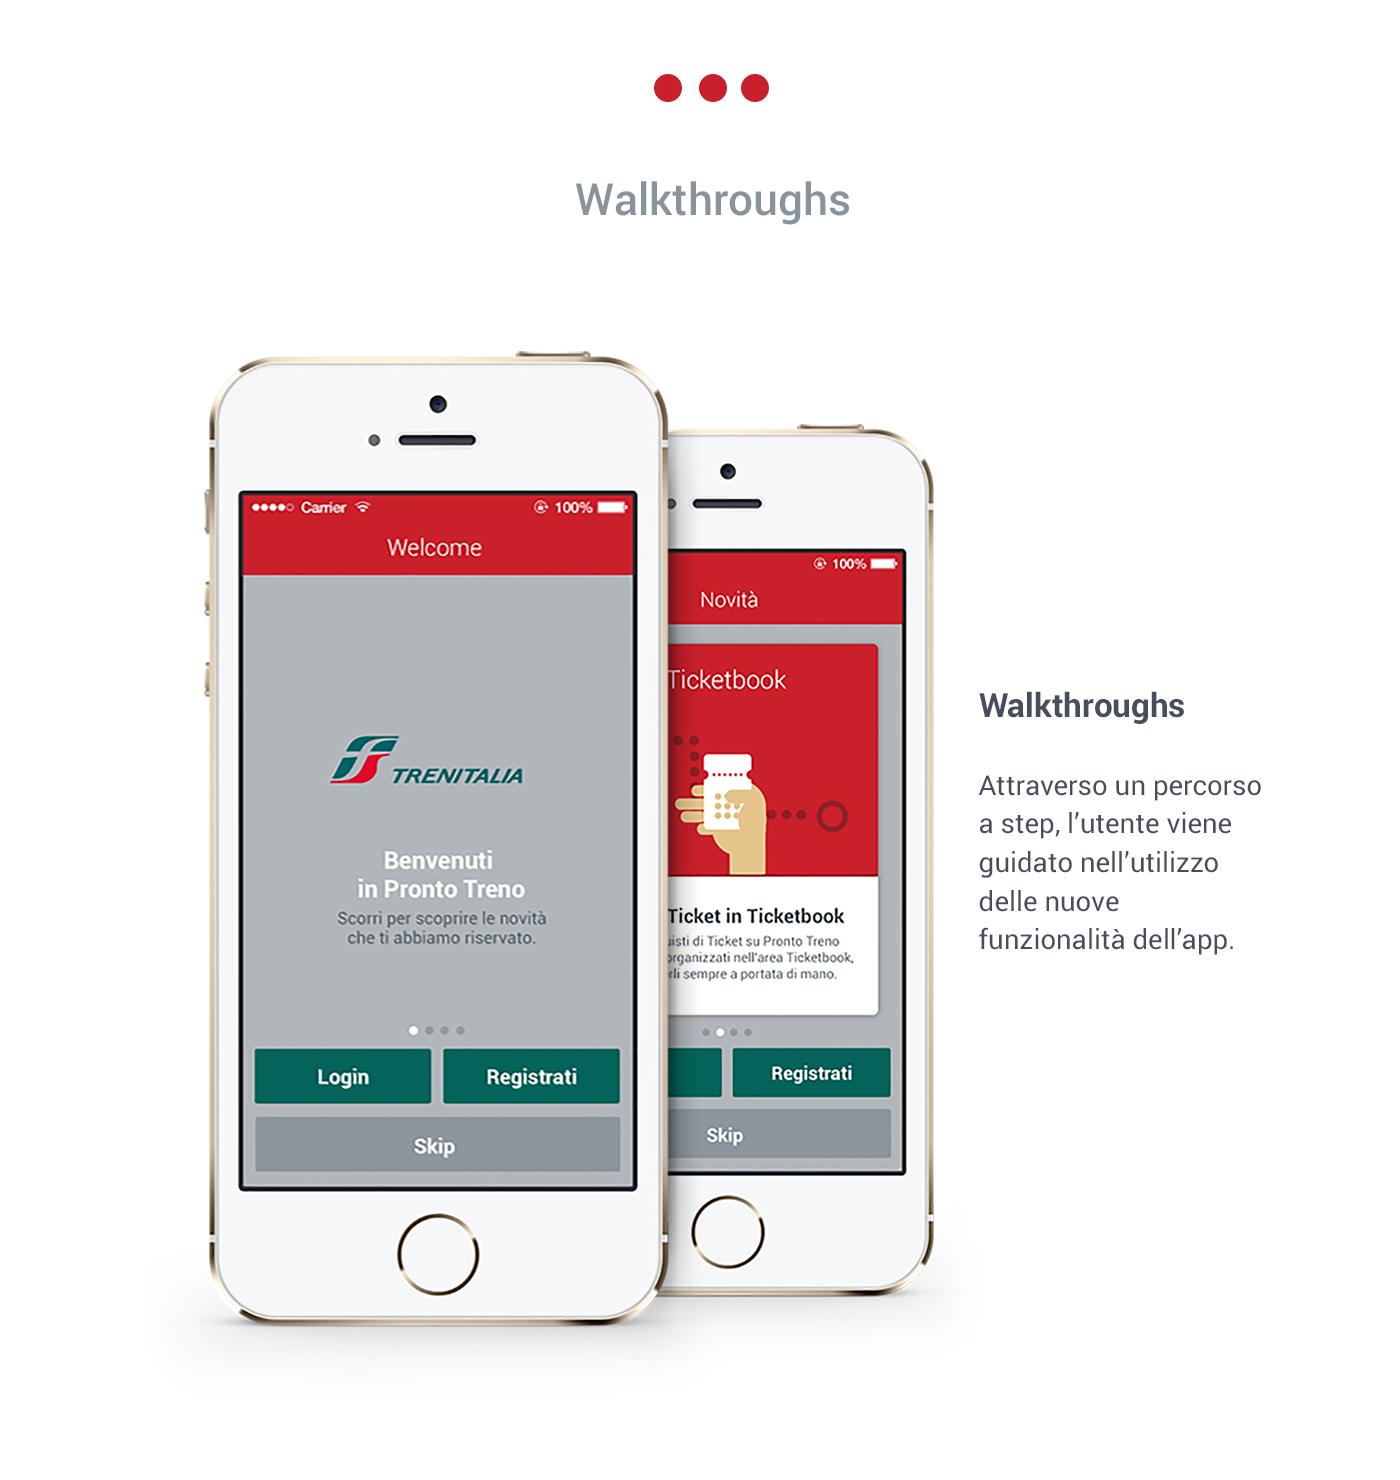 Trenitalia,Prontotreno,Pronto Treno,train,UI,wireframe,interaction,design,rails,italian,app,styleguide,icons,treno